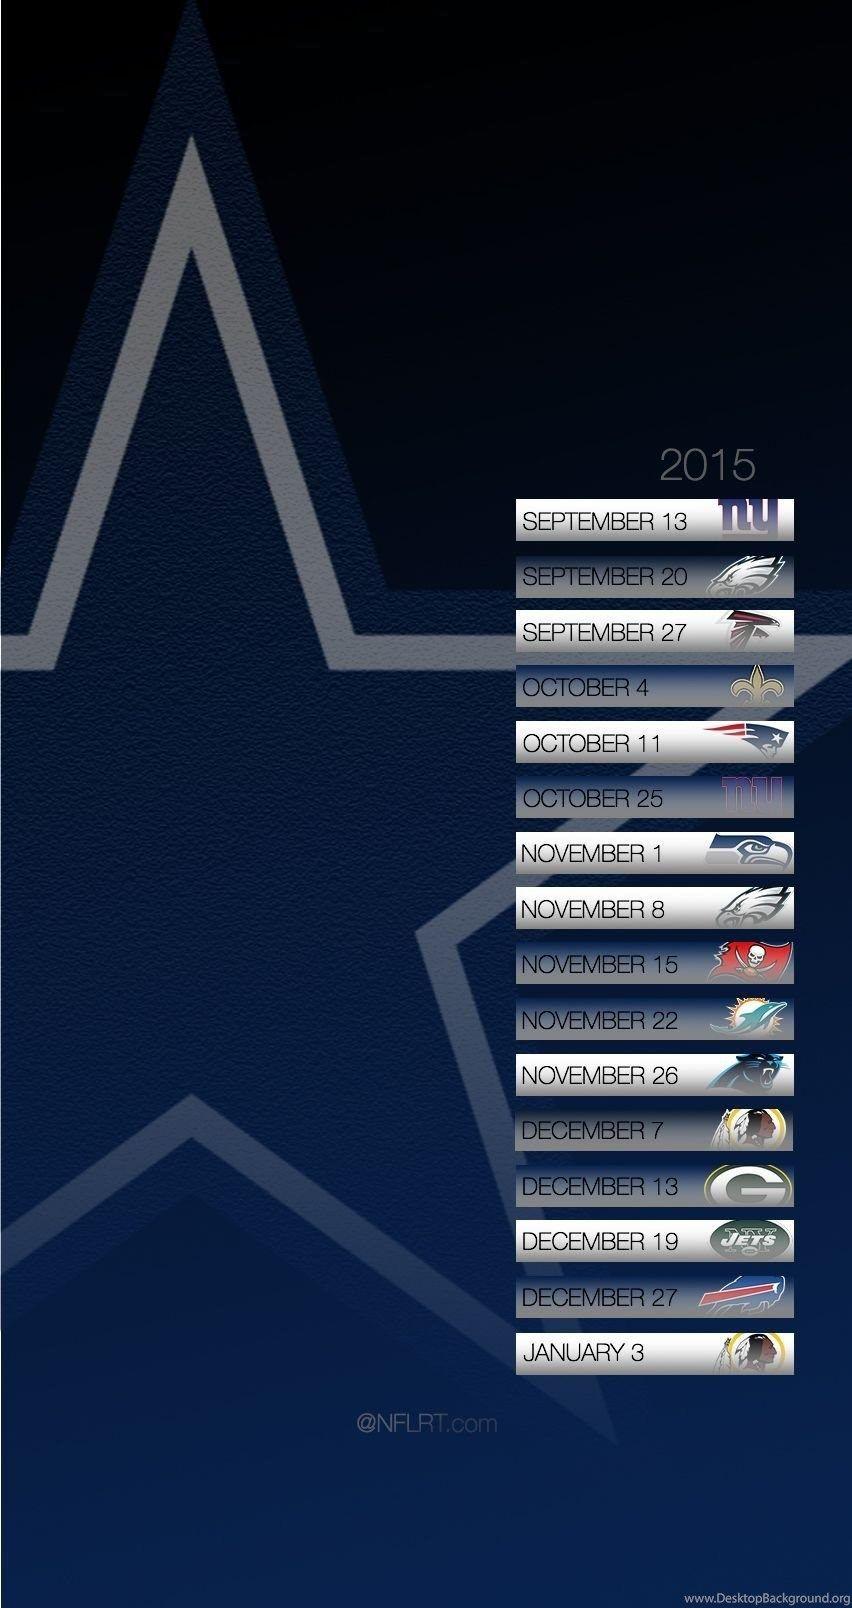 Dallas Cowboys Wallpapers For Android Q2j Mywallpaperworld - Cowboys Screensaver I Phone Schedule 2017 - HD Wallpaper